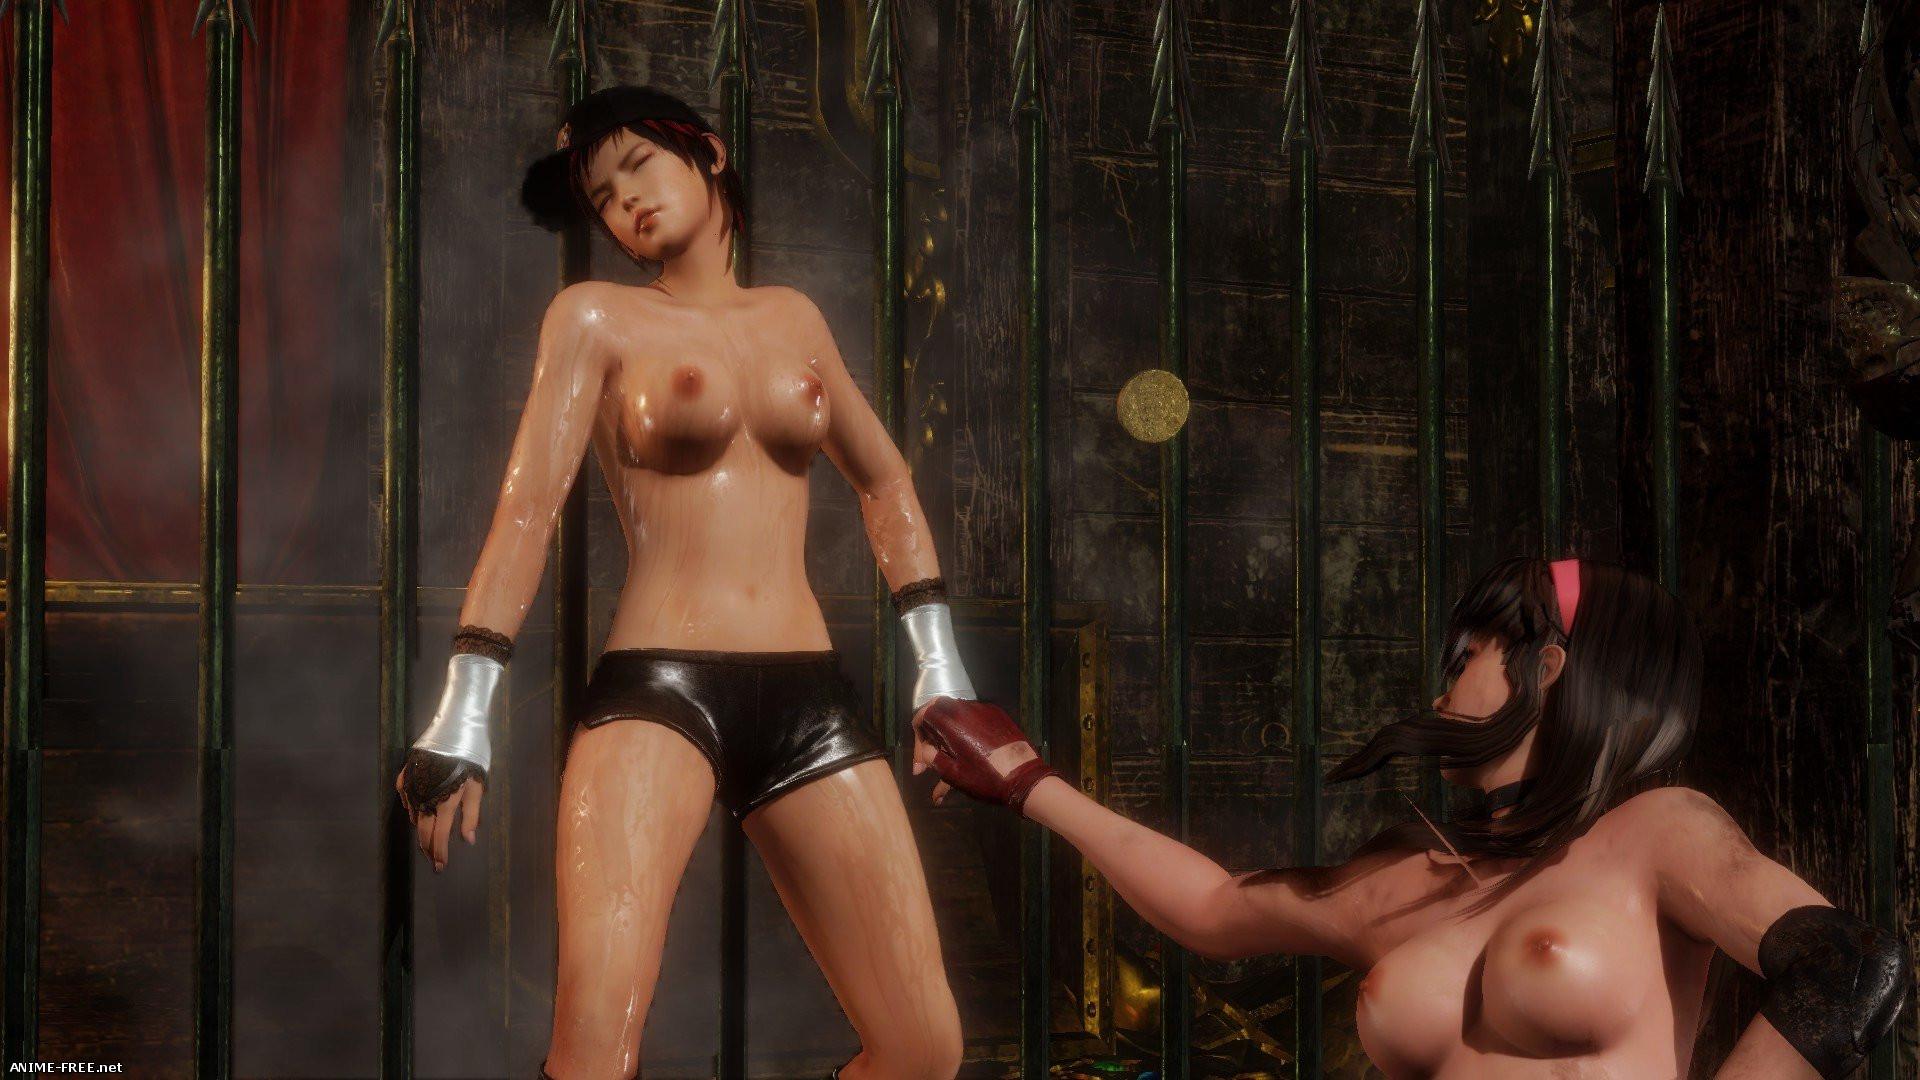 Dead or Alive 6: Nude Mode / Живой или Мертвый 6: Голые Моды [2019] [Uncen] [Fighting, 3DCG] [RUS,ENG,Multi] H-Game